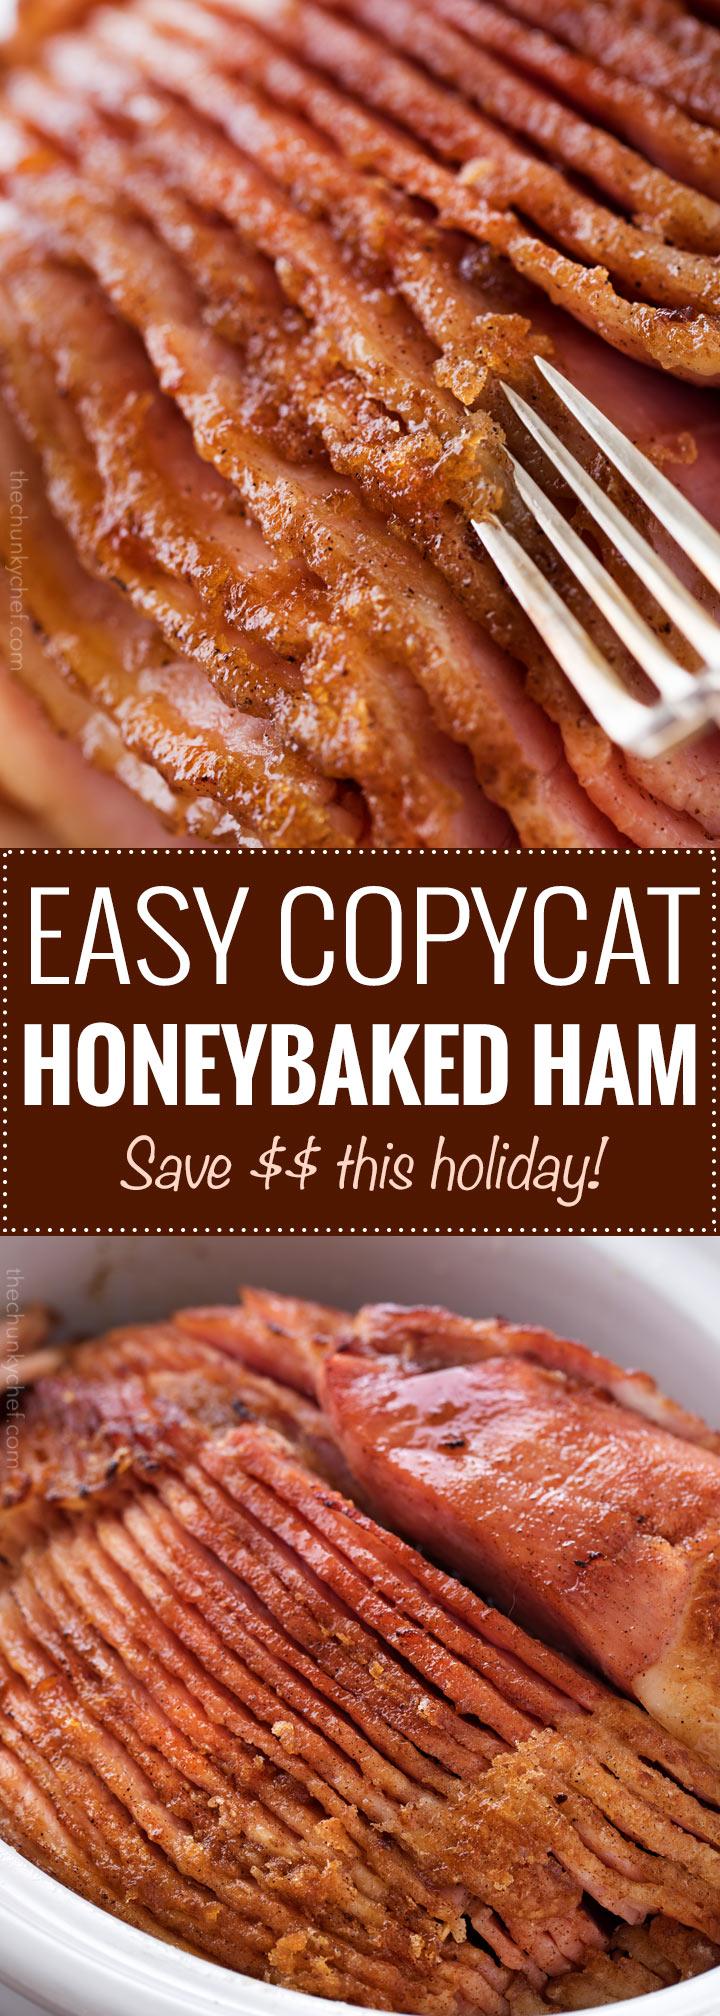 Large Of Honeybaked Ham Locations